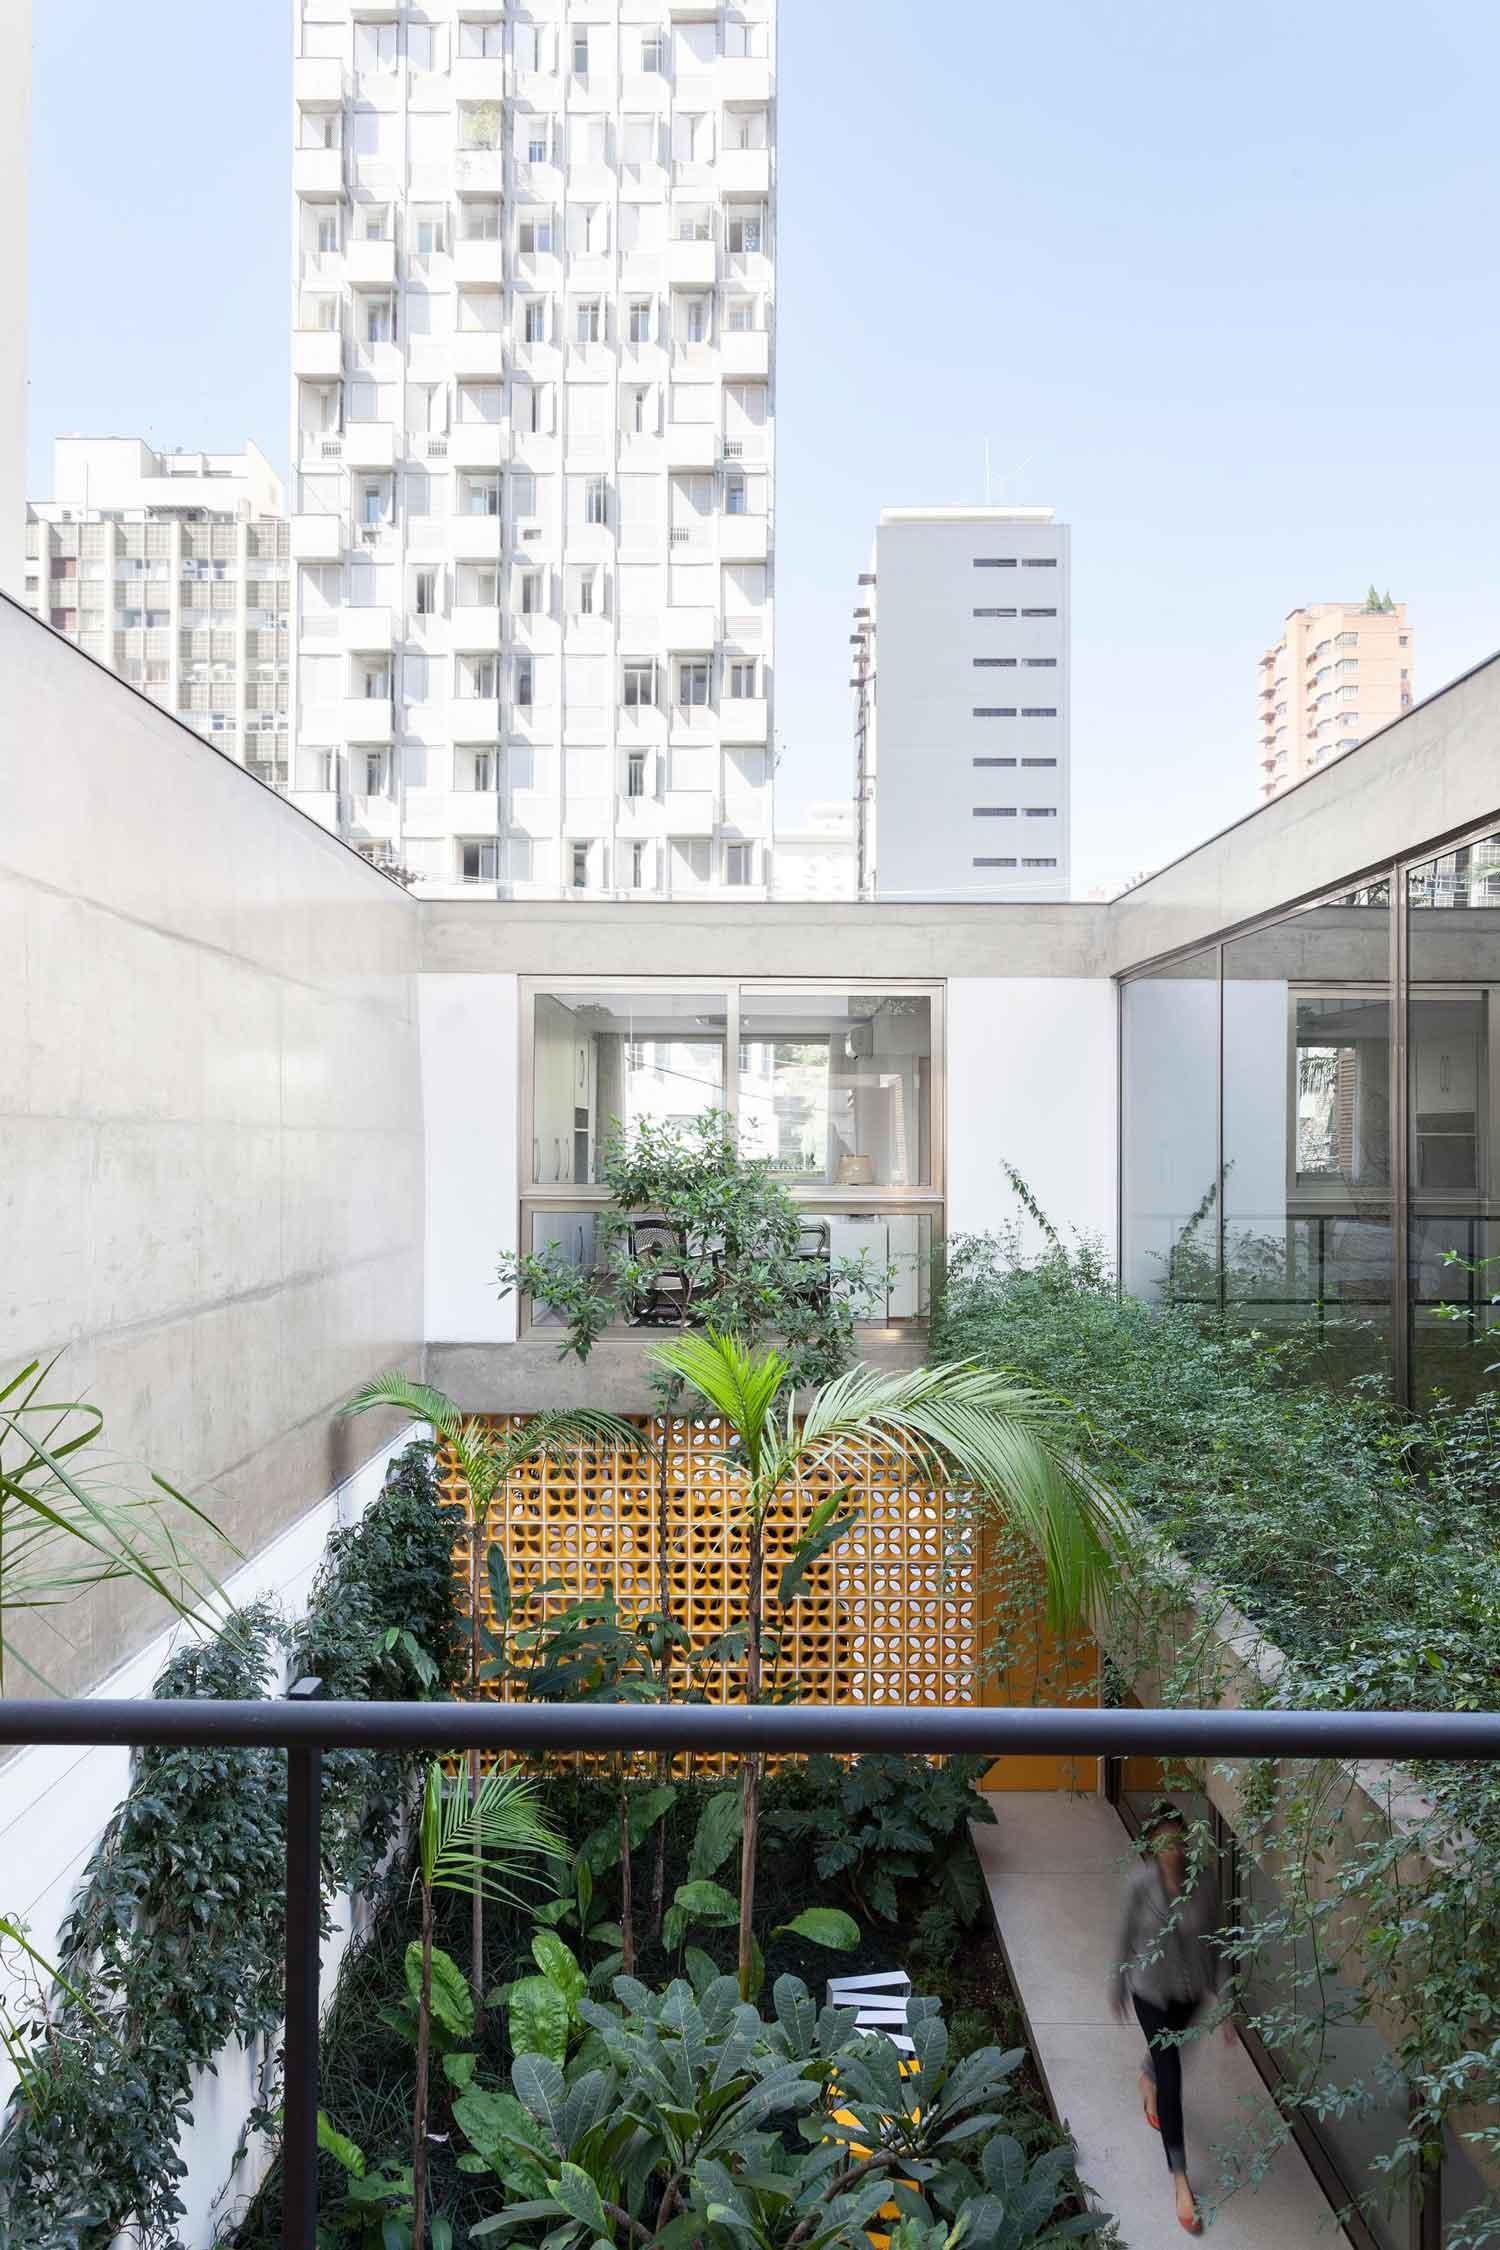 naman spa by mia design studio | corridor | pinterest | spas, Gartengerate ideen